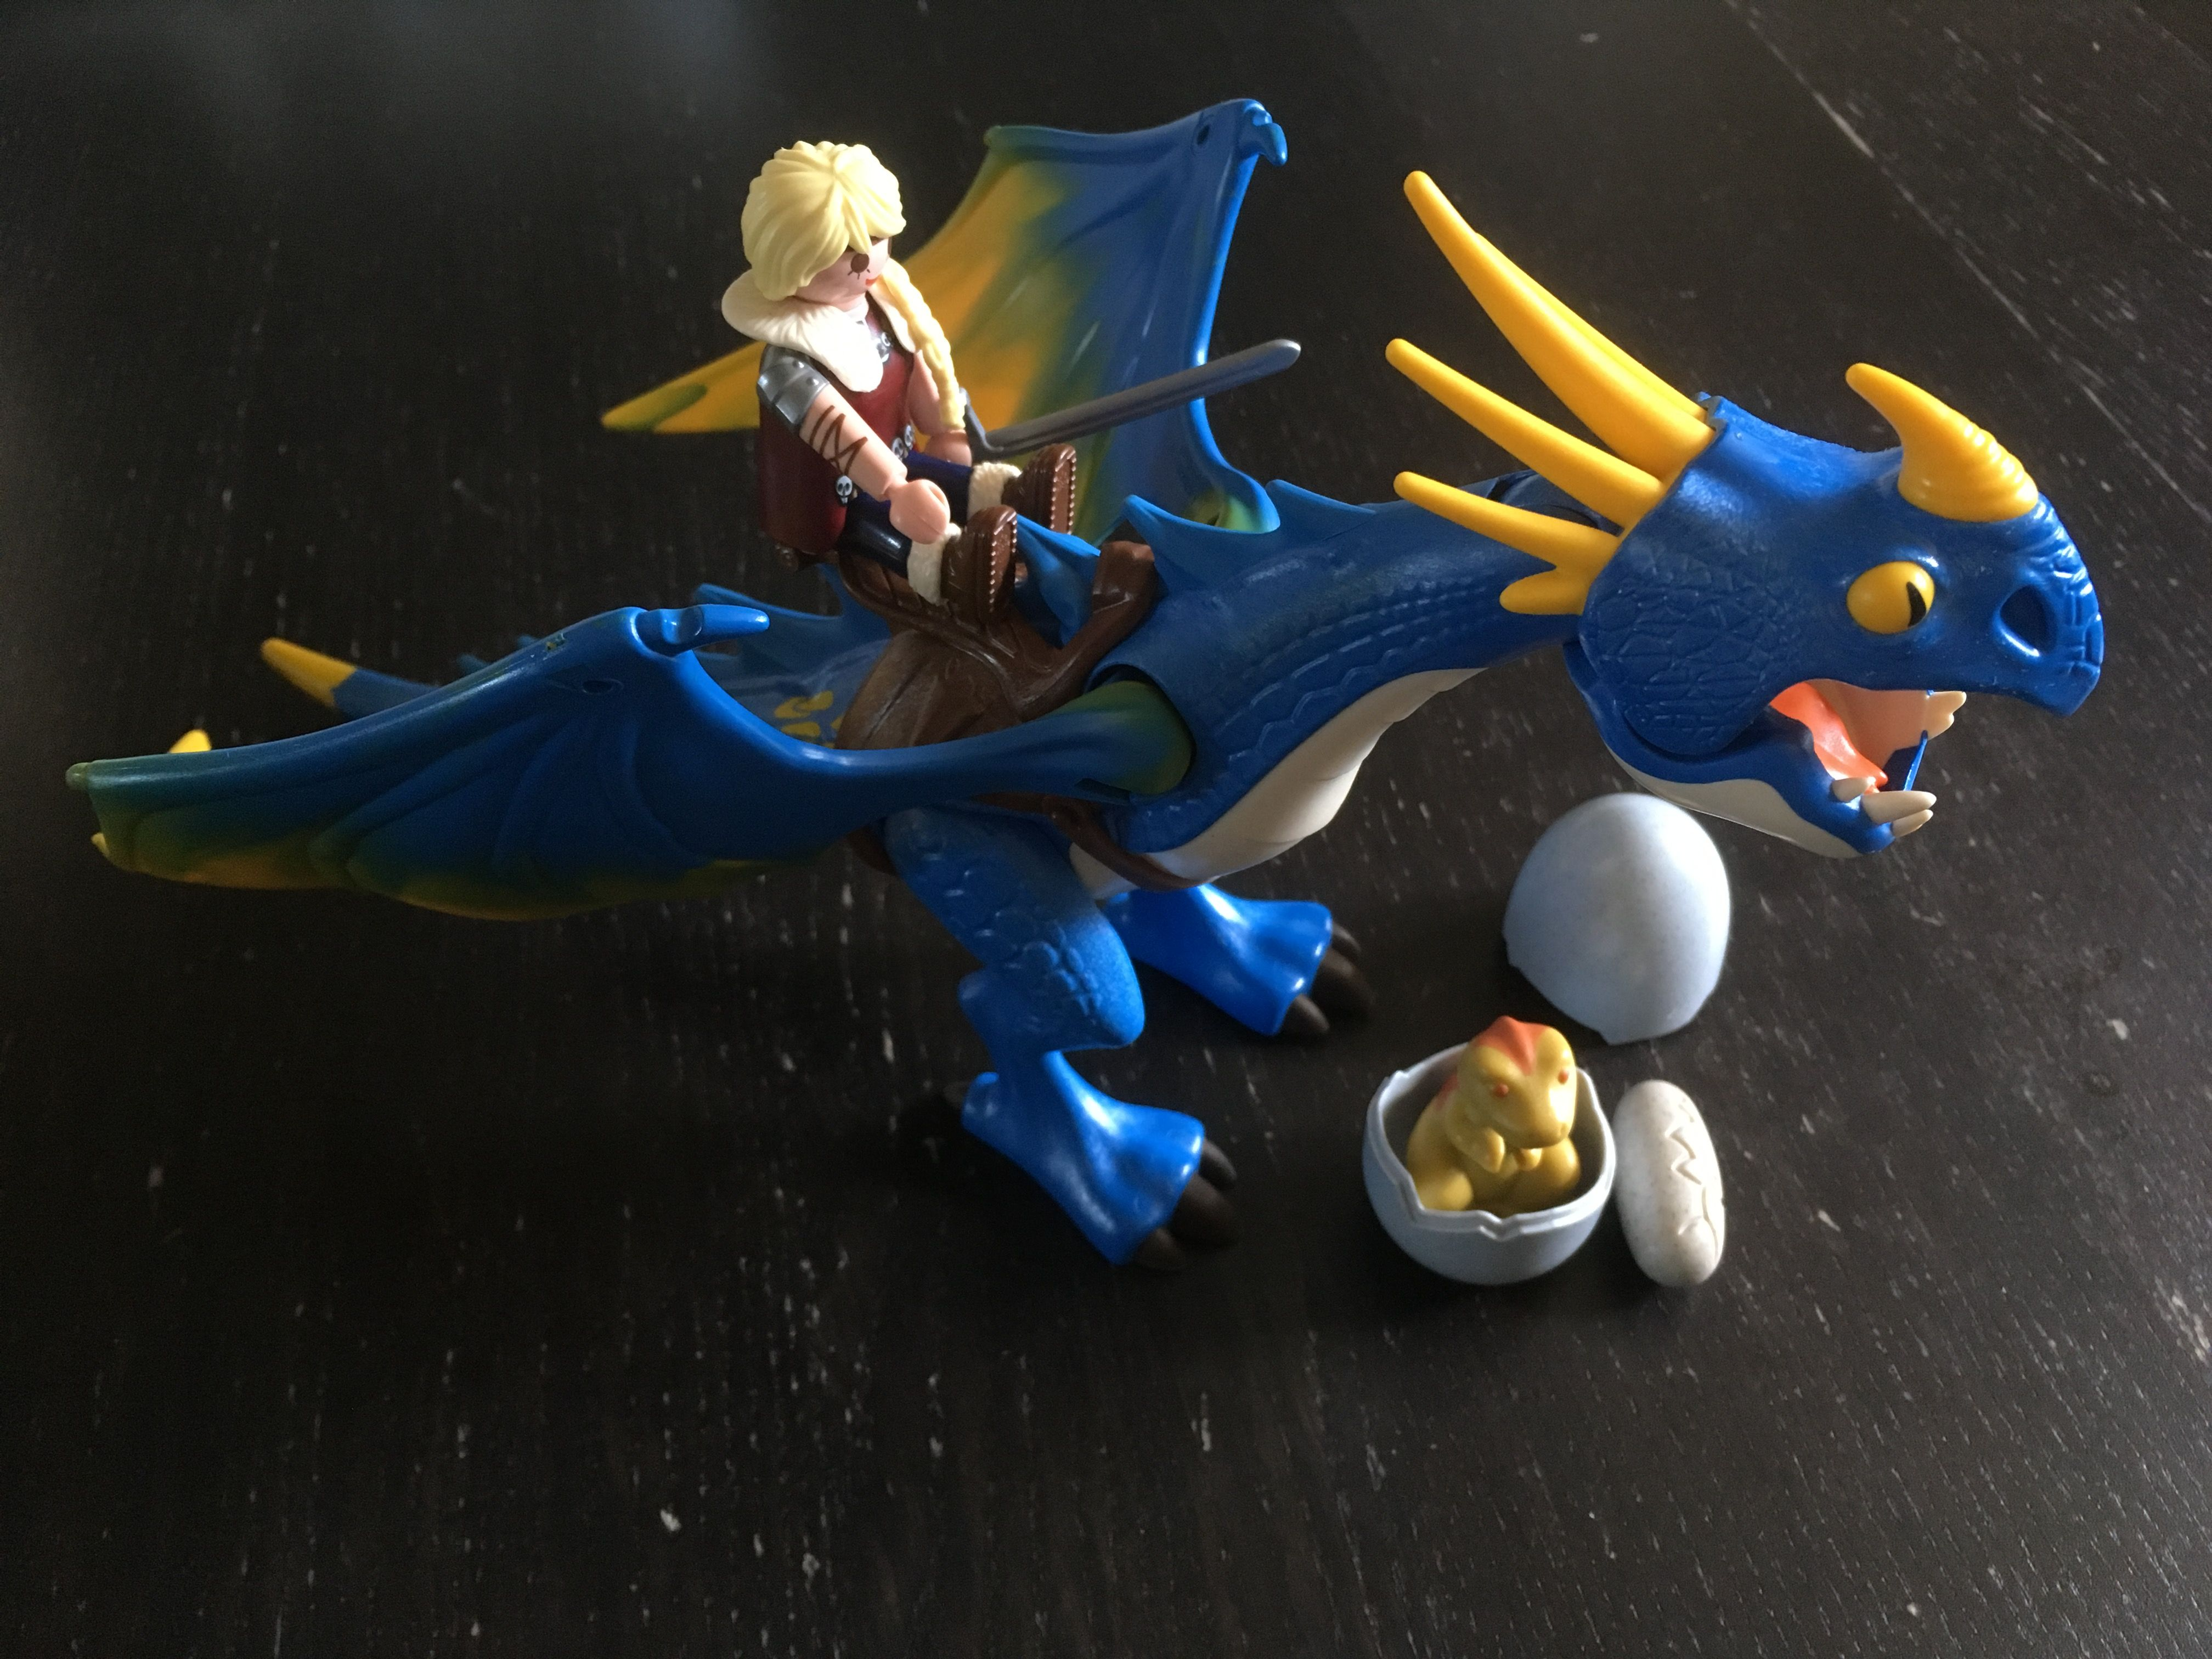 Hoquet Bébé 3 Astrid Dragon Et Dragons Playmobil Avec rdChQts